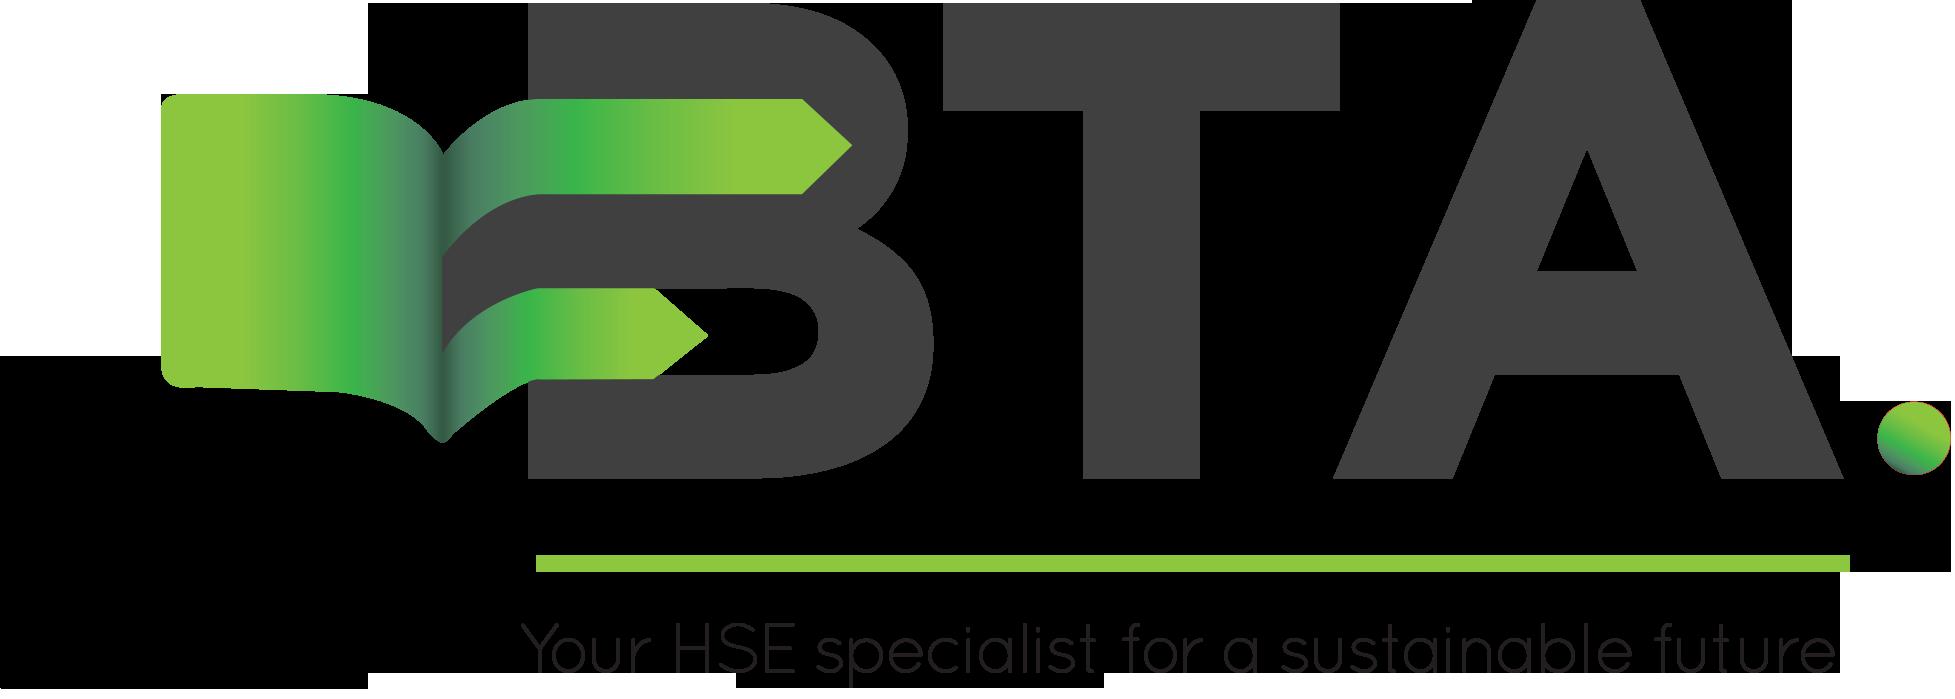 BTA Logo Concepts 7 - Home